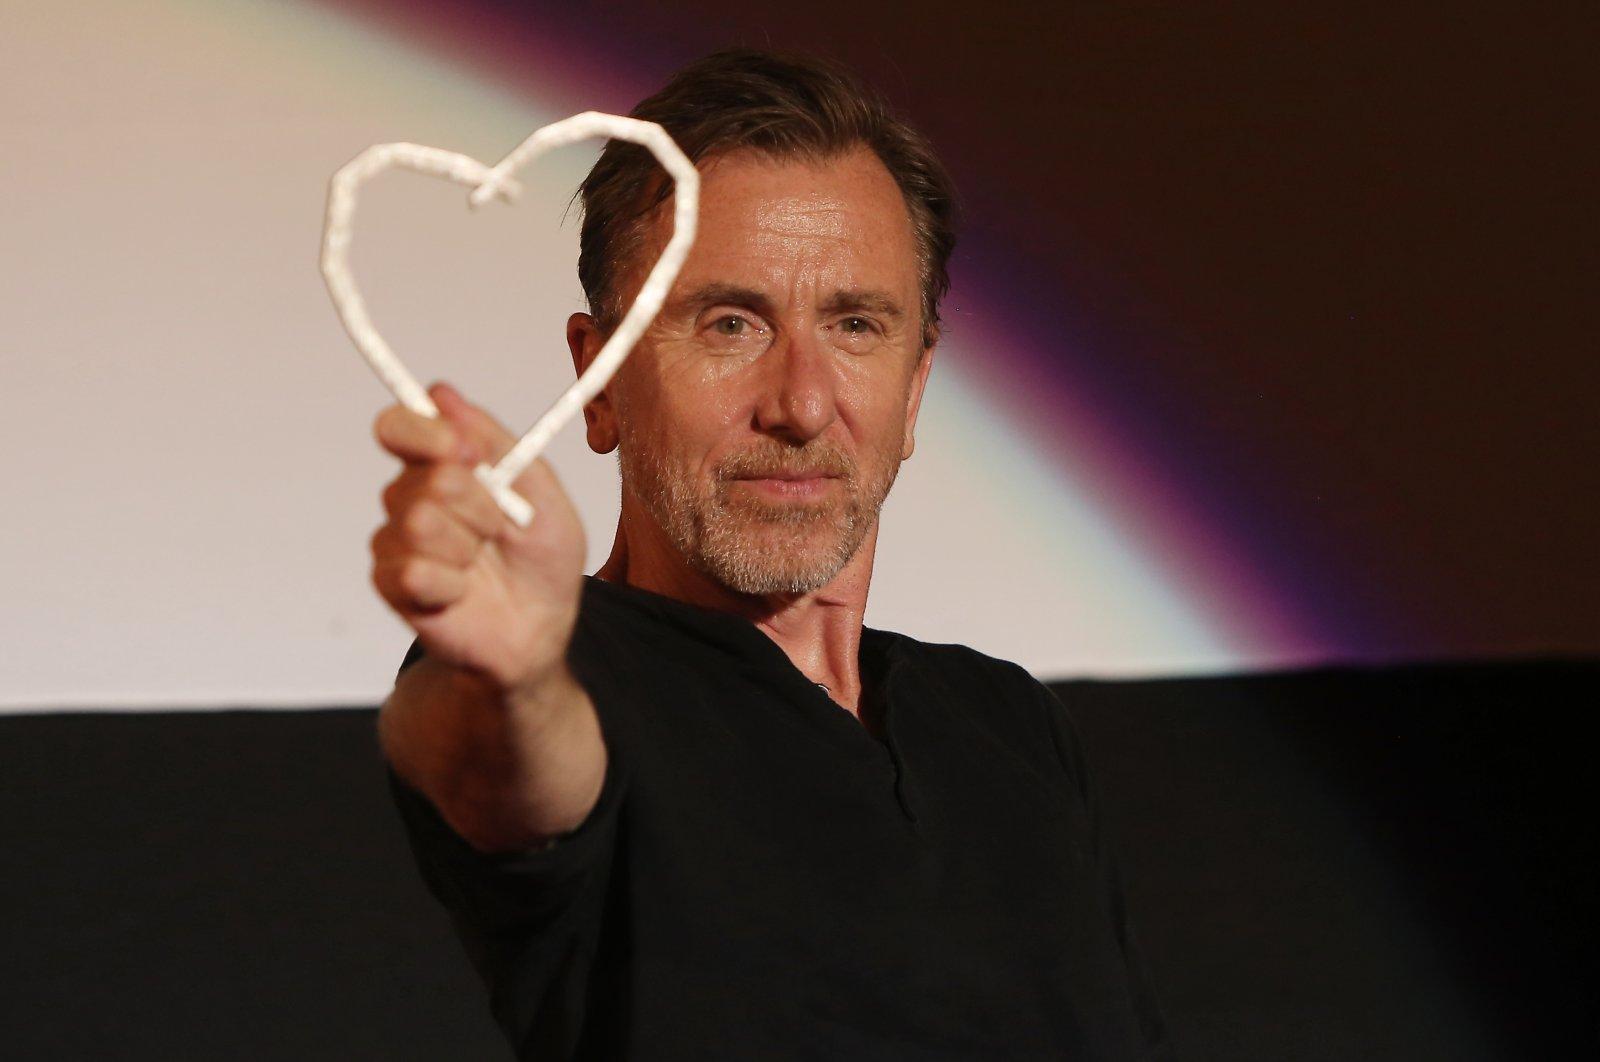 The Honorary Heart of Sarajevo presented to Tim Roth at the 25th Sarajevo Film Festival, Sarajevo, Bosnia-Herzegovina, Aug. 20, 2019. (Shutterstock Photo)